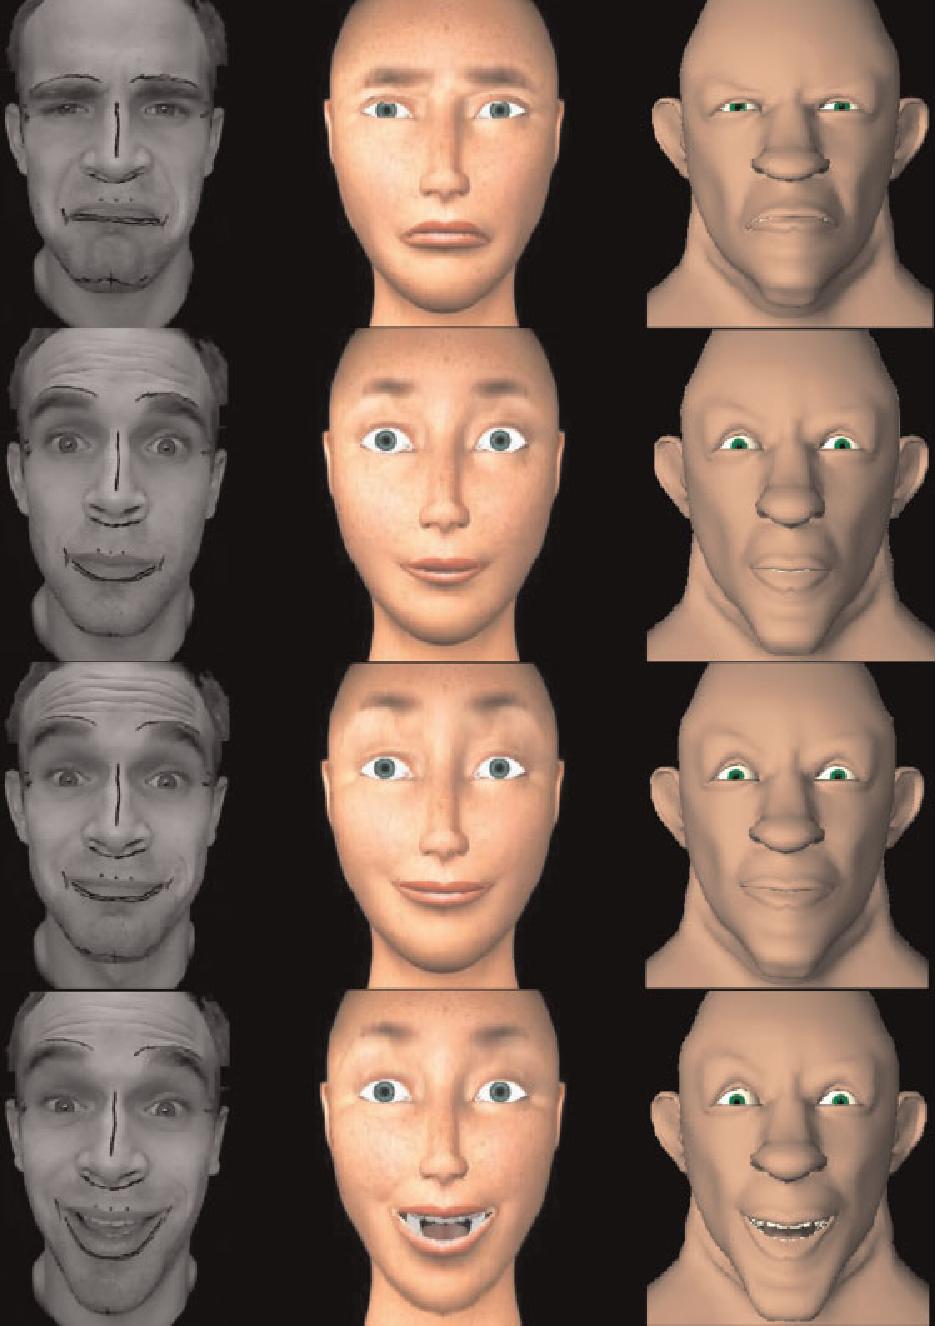 Animation Retargeting facial animation retargeting and control based on a human